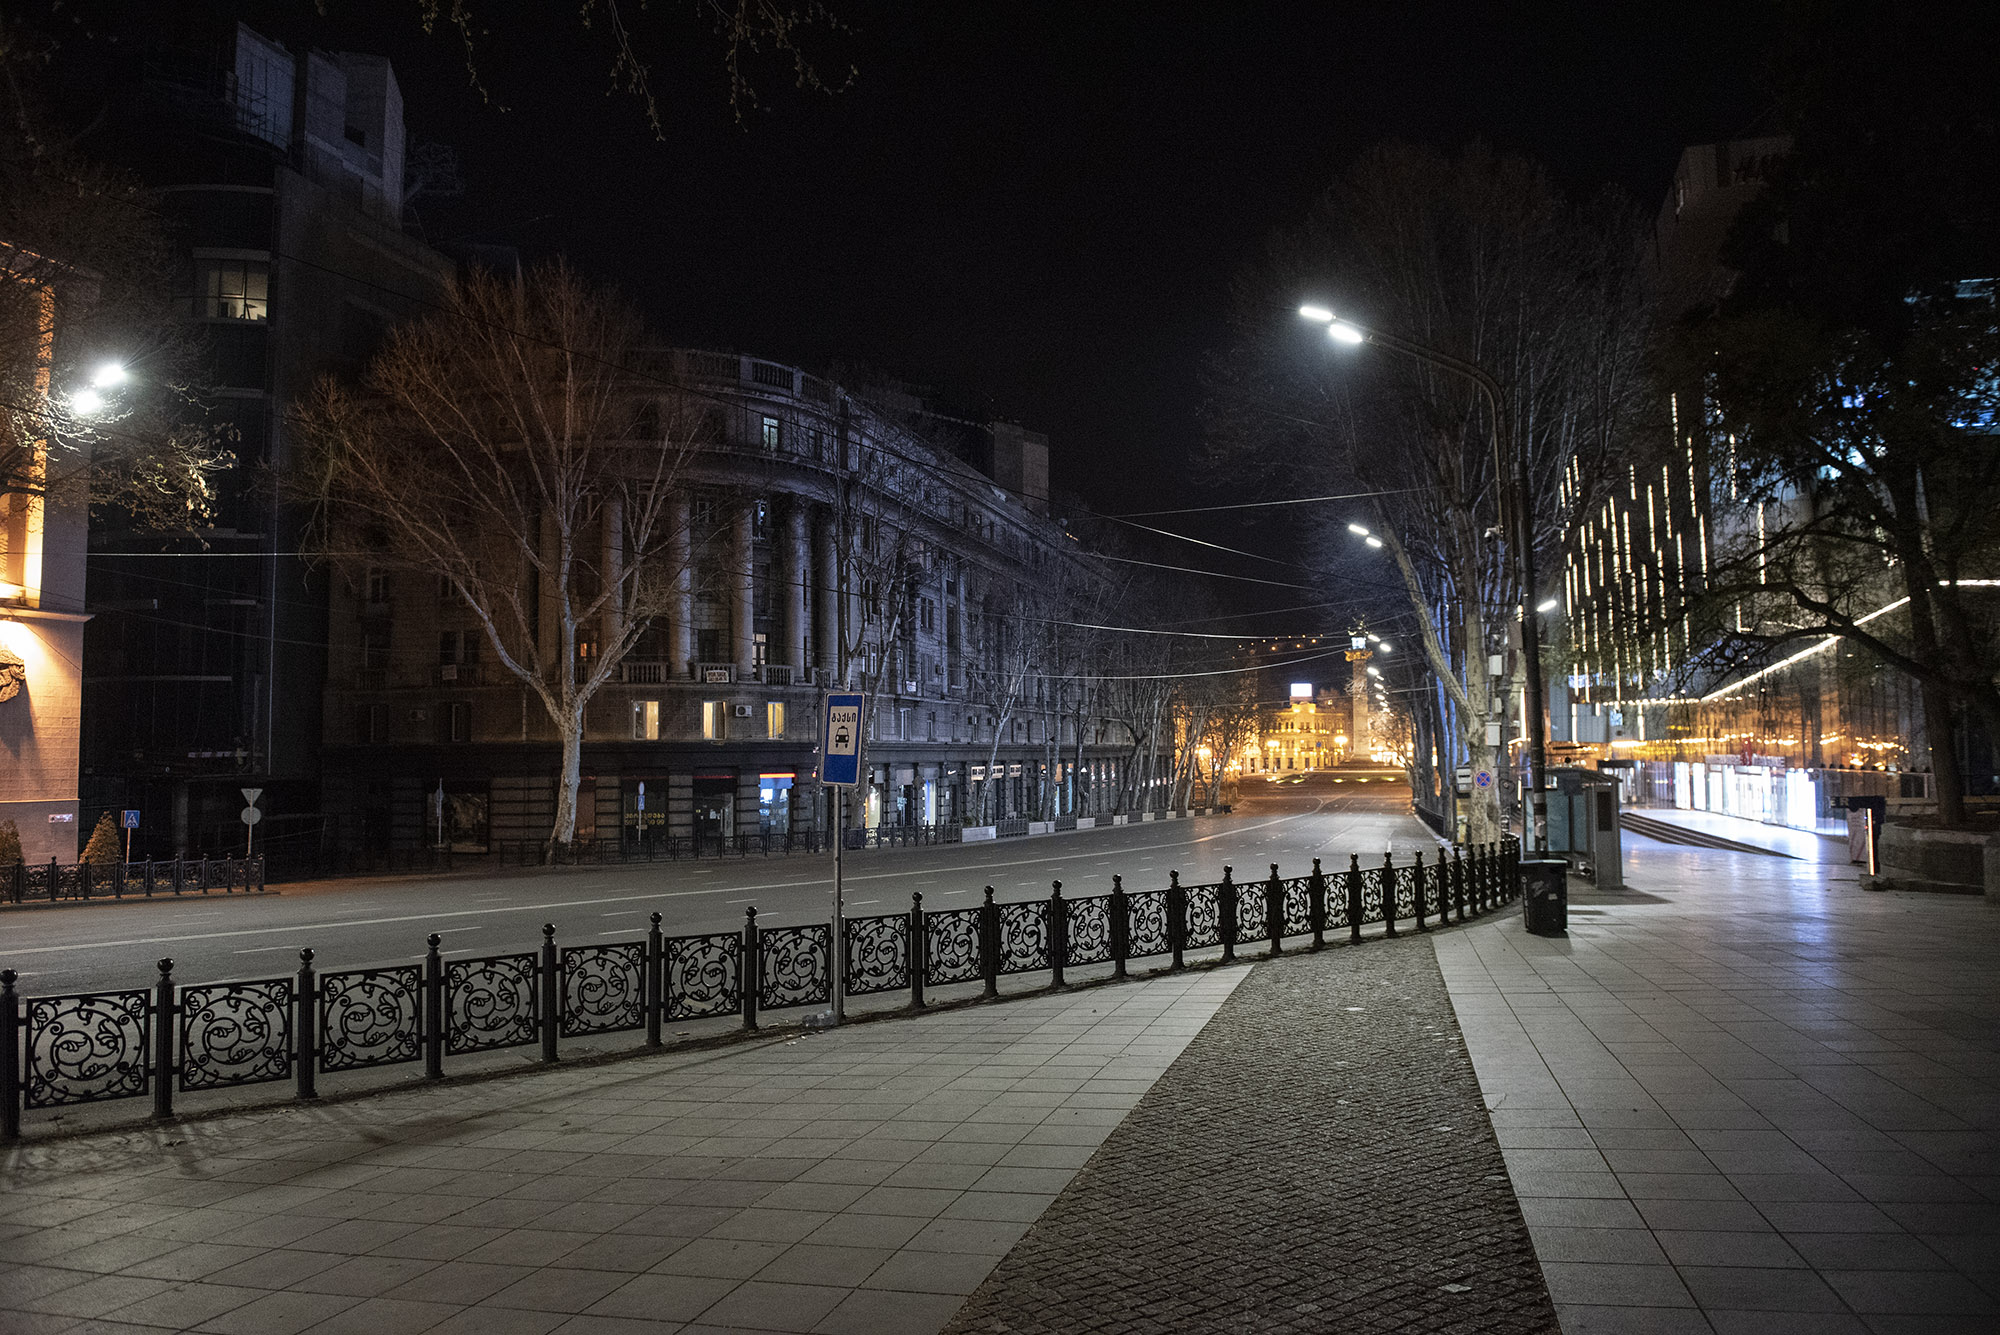 Проспект Руставели. Фото: Мариам Никурадзе/OC Media